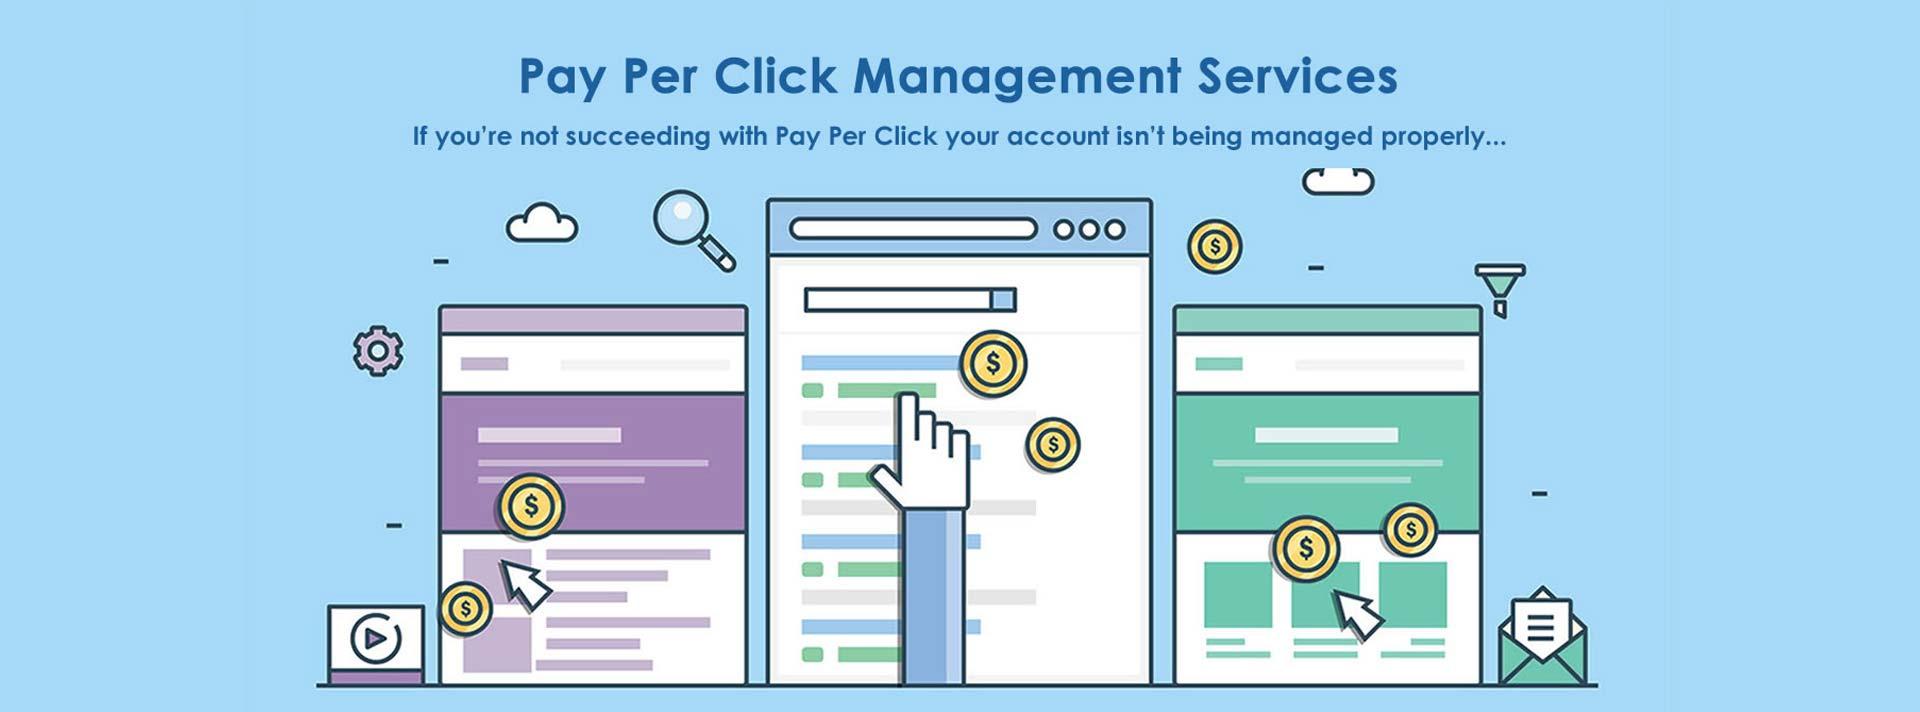 Our PPC Management Services?